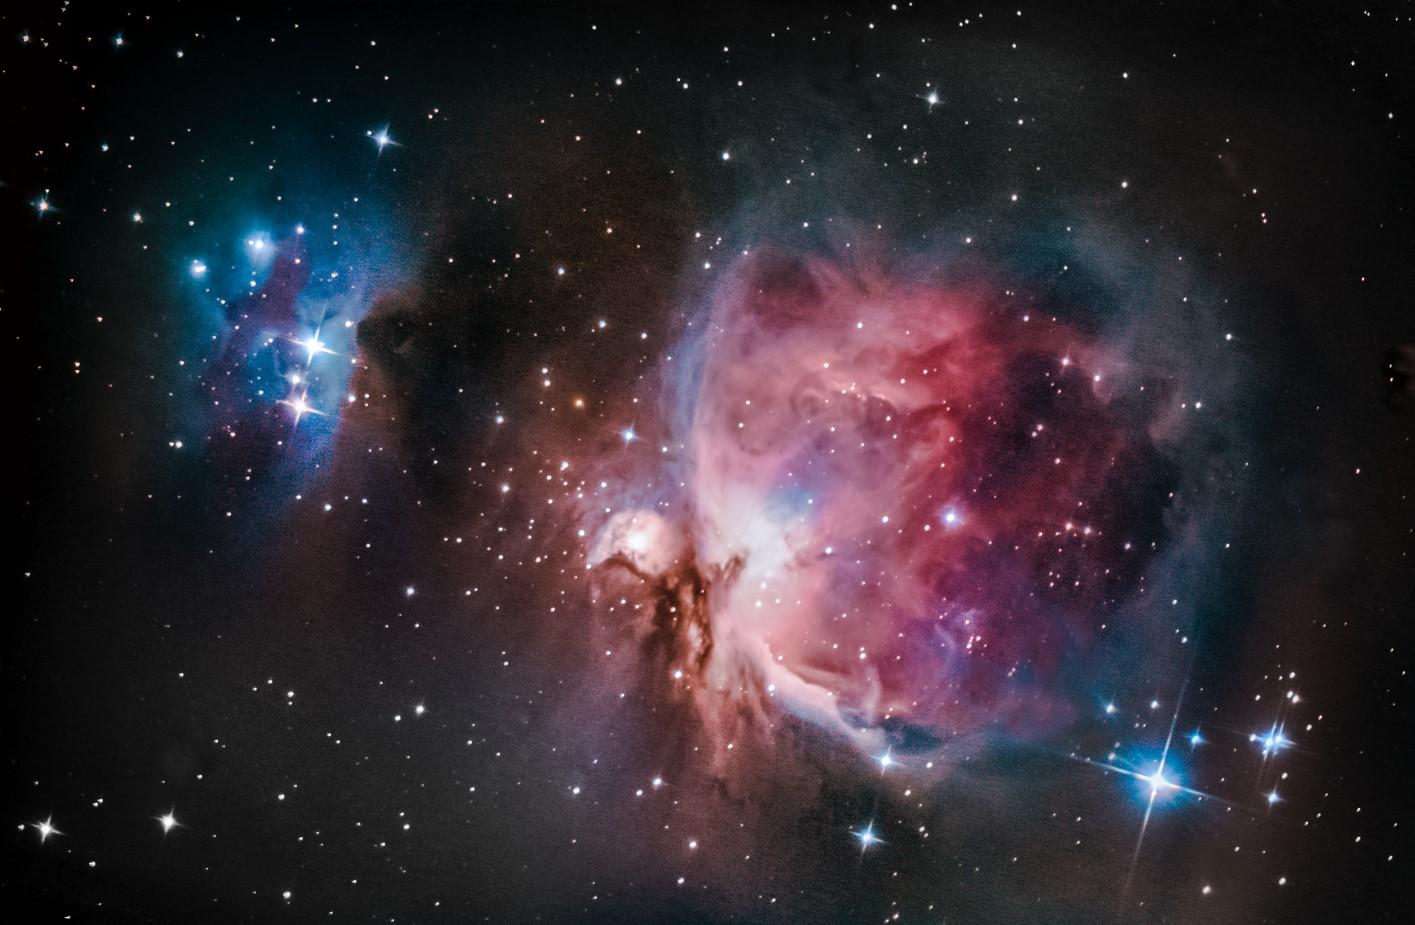 M42 - Mlhovina v Orionu